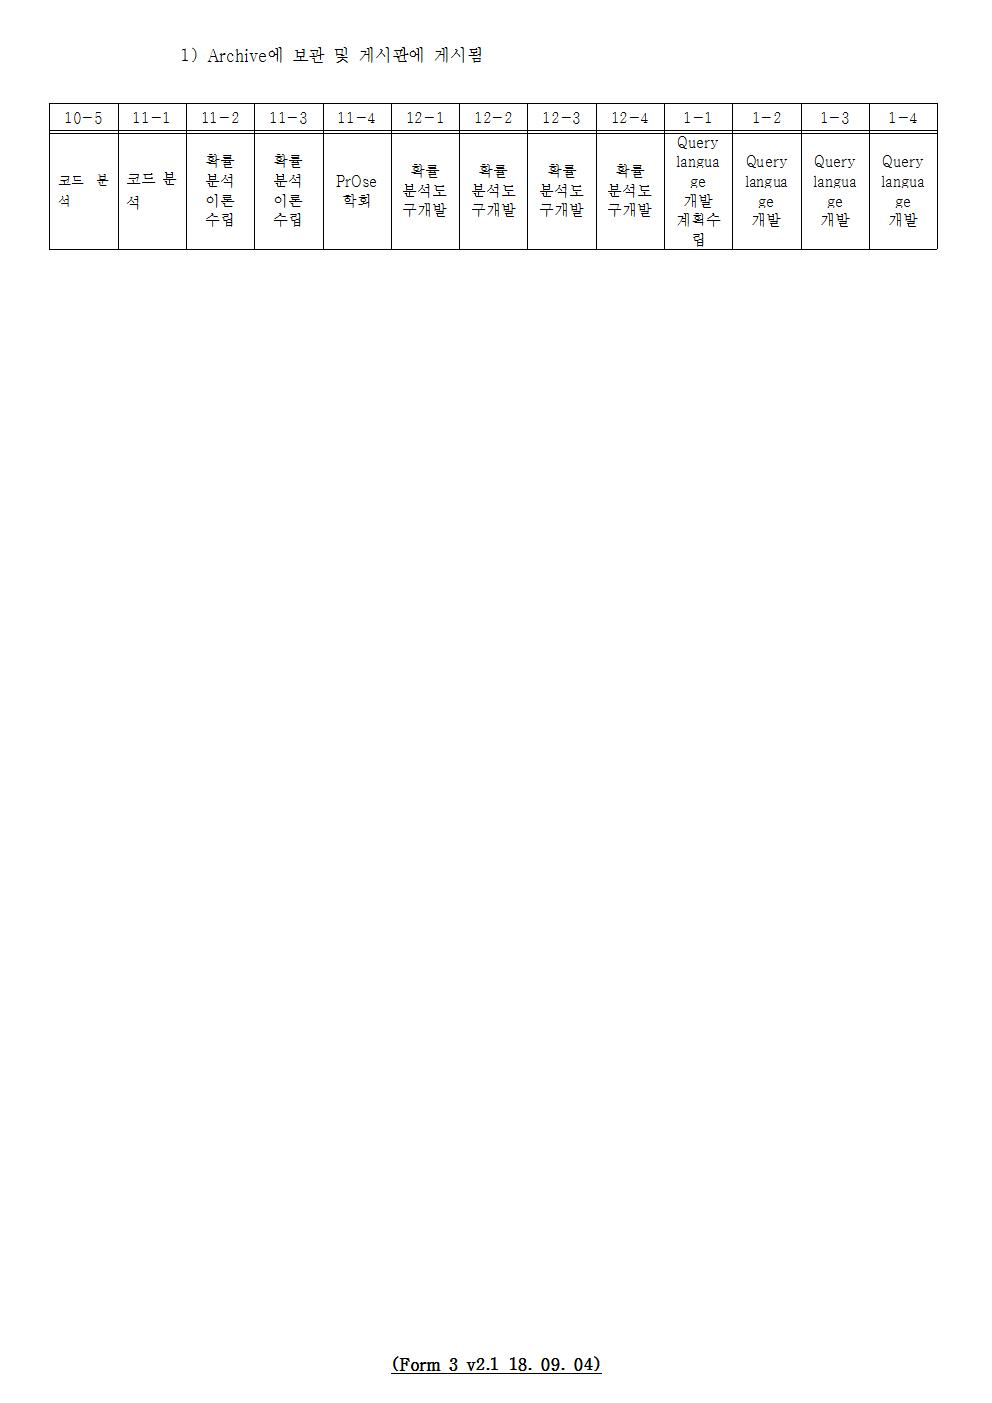 D-[19-001-RD-01]-[SAVE]-[2019-11-01][SH]-[19-10-5]-[P+D+C]002.jpg